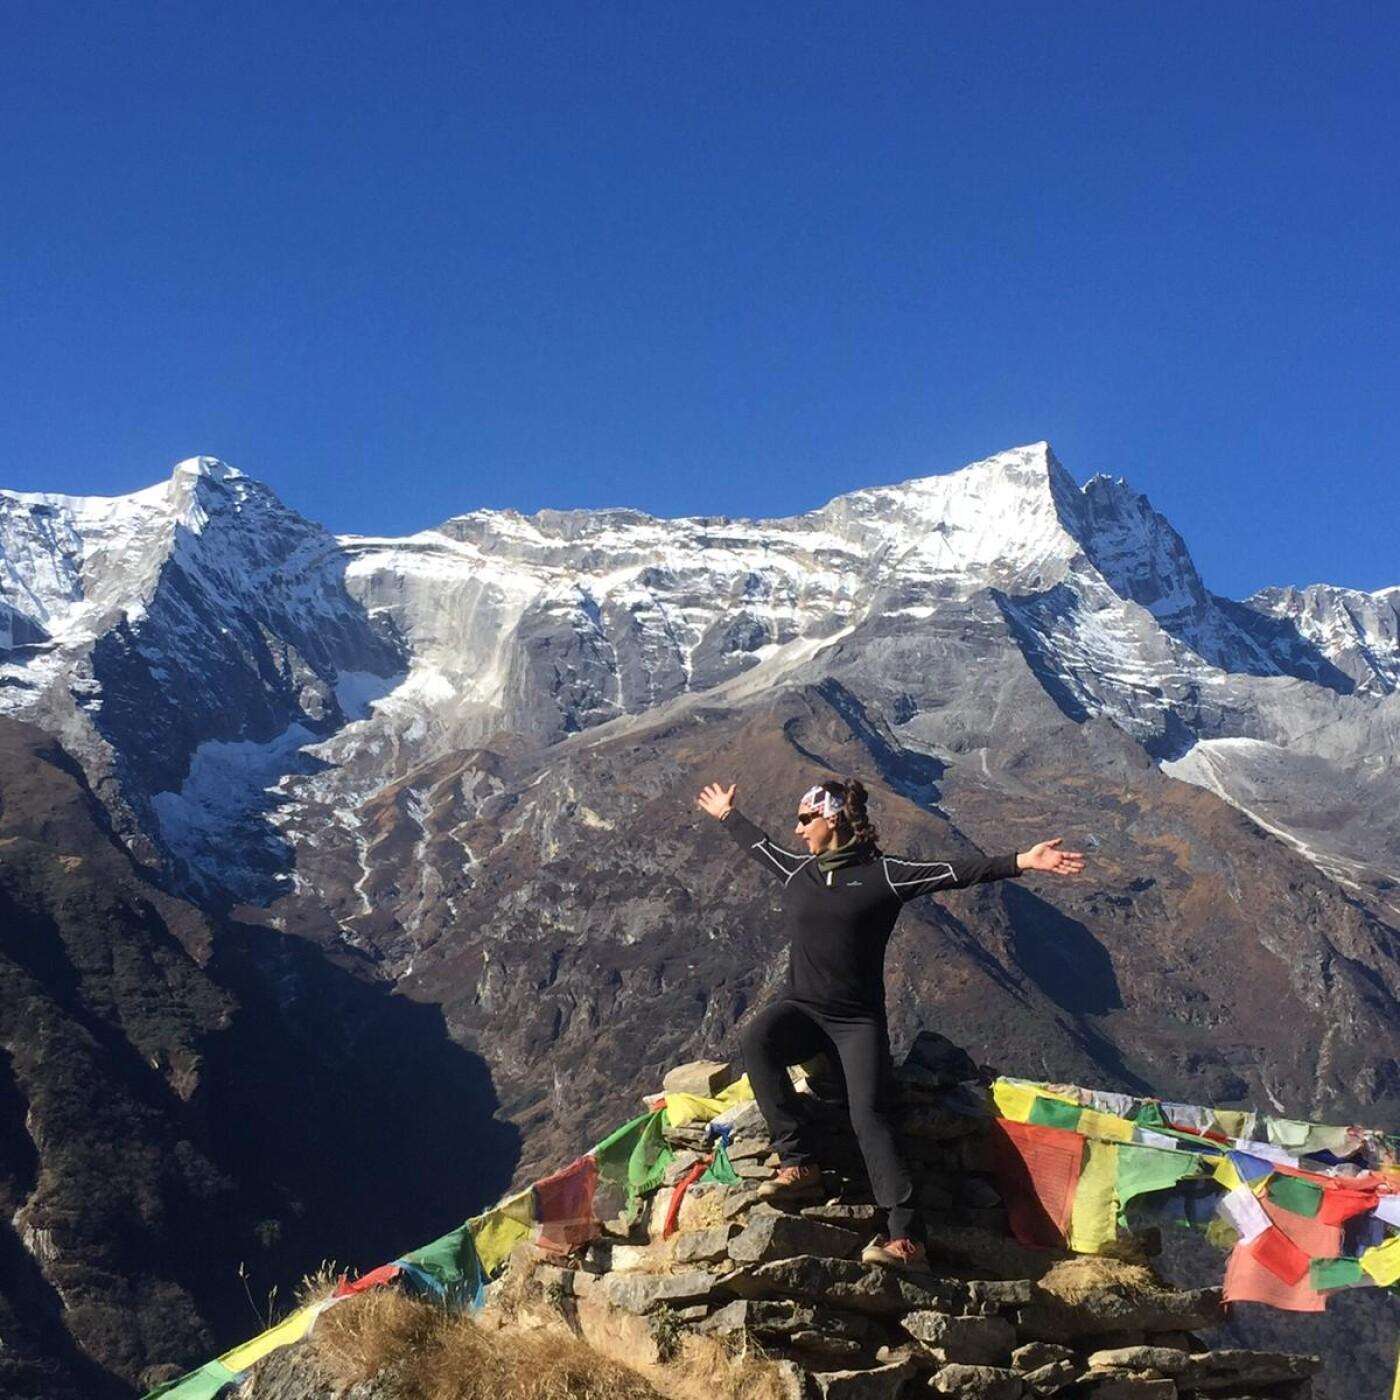 Magali raconte son trek au Népal, 12 j pour gravir l'Everest - 01 03 2021 - StereoChic Radio